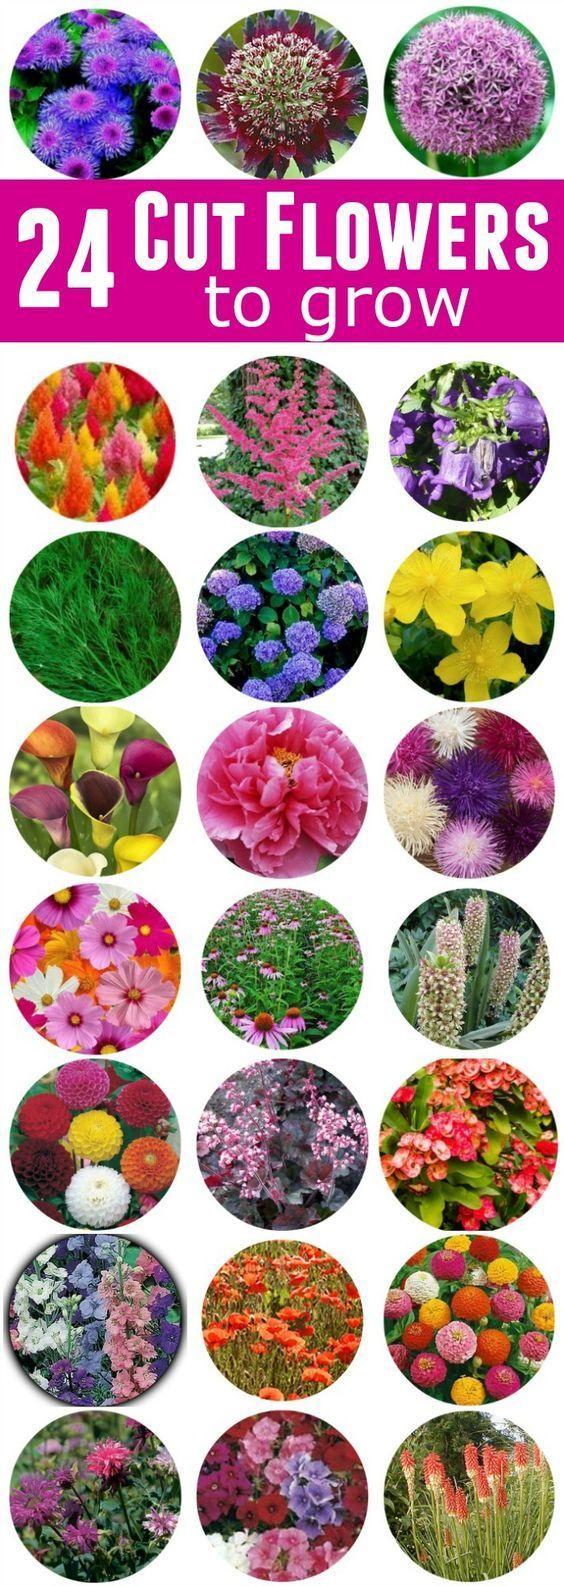 17 images about home garden ideas on pinterest for Cut flower garden designs